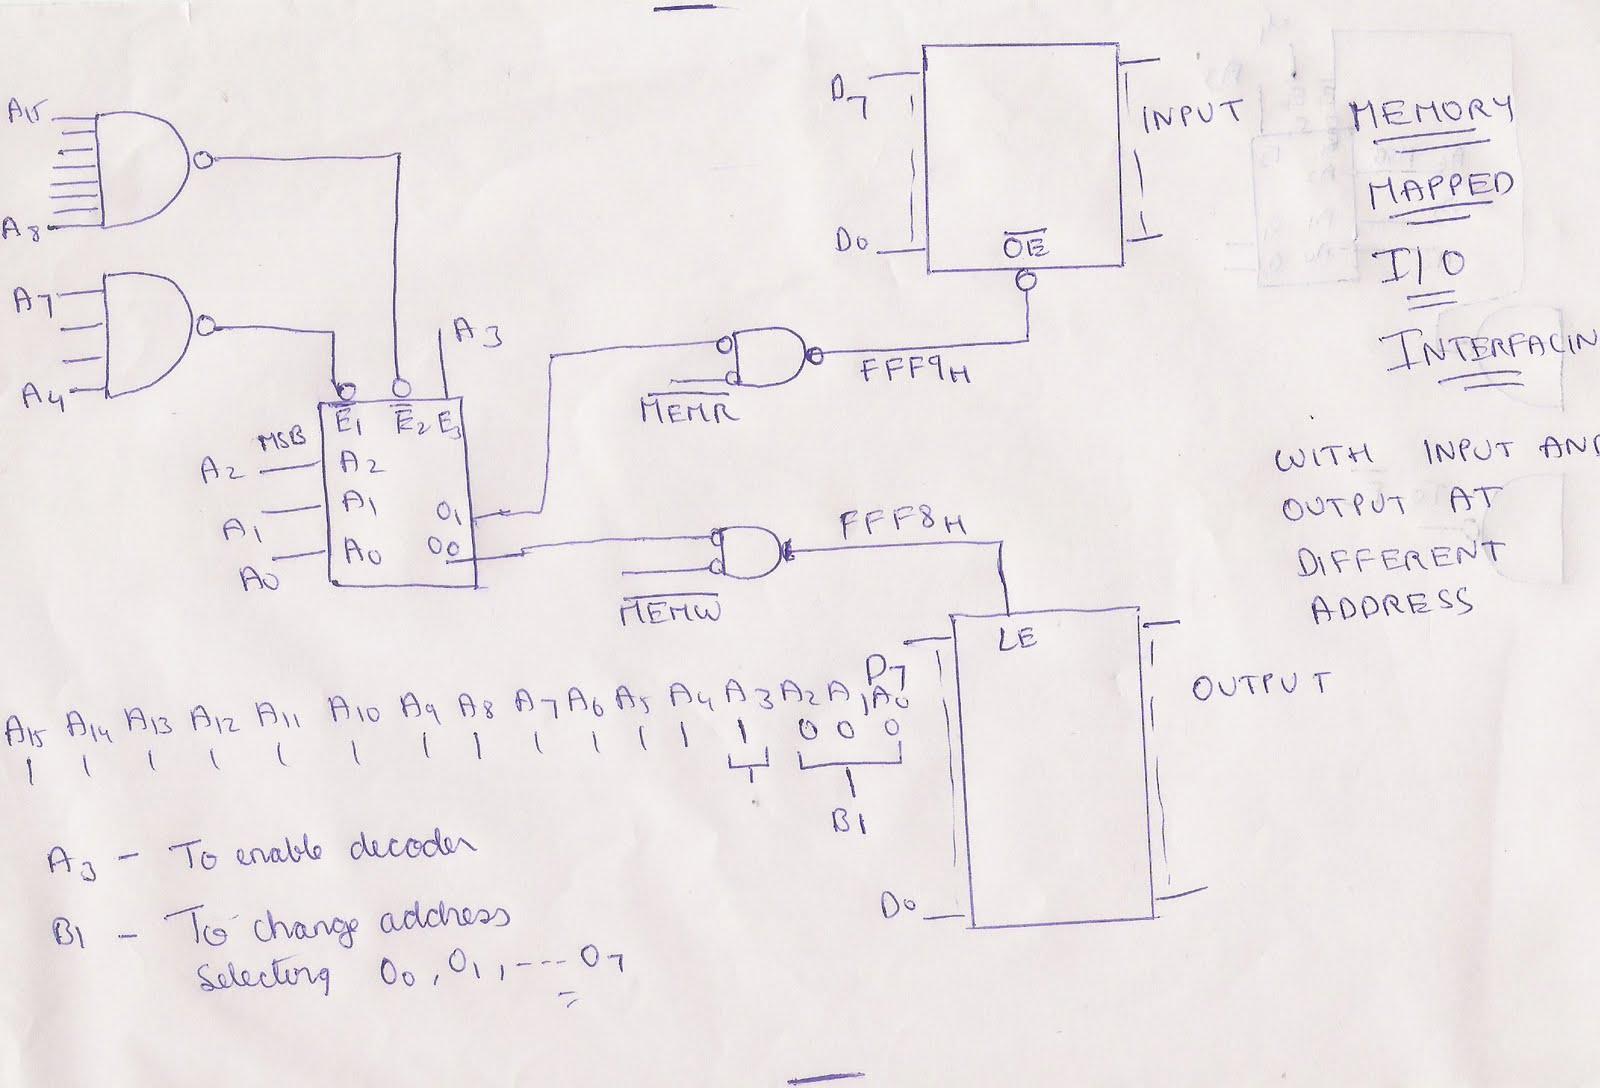 architecture of 8085 microprocessor with block diagram pdf visio spaghetti memory interfacing in softwarelost